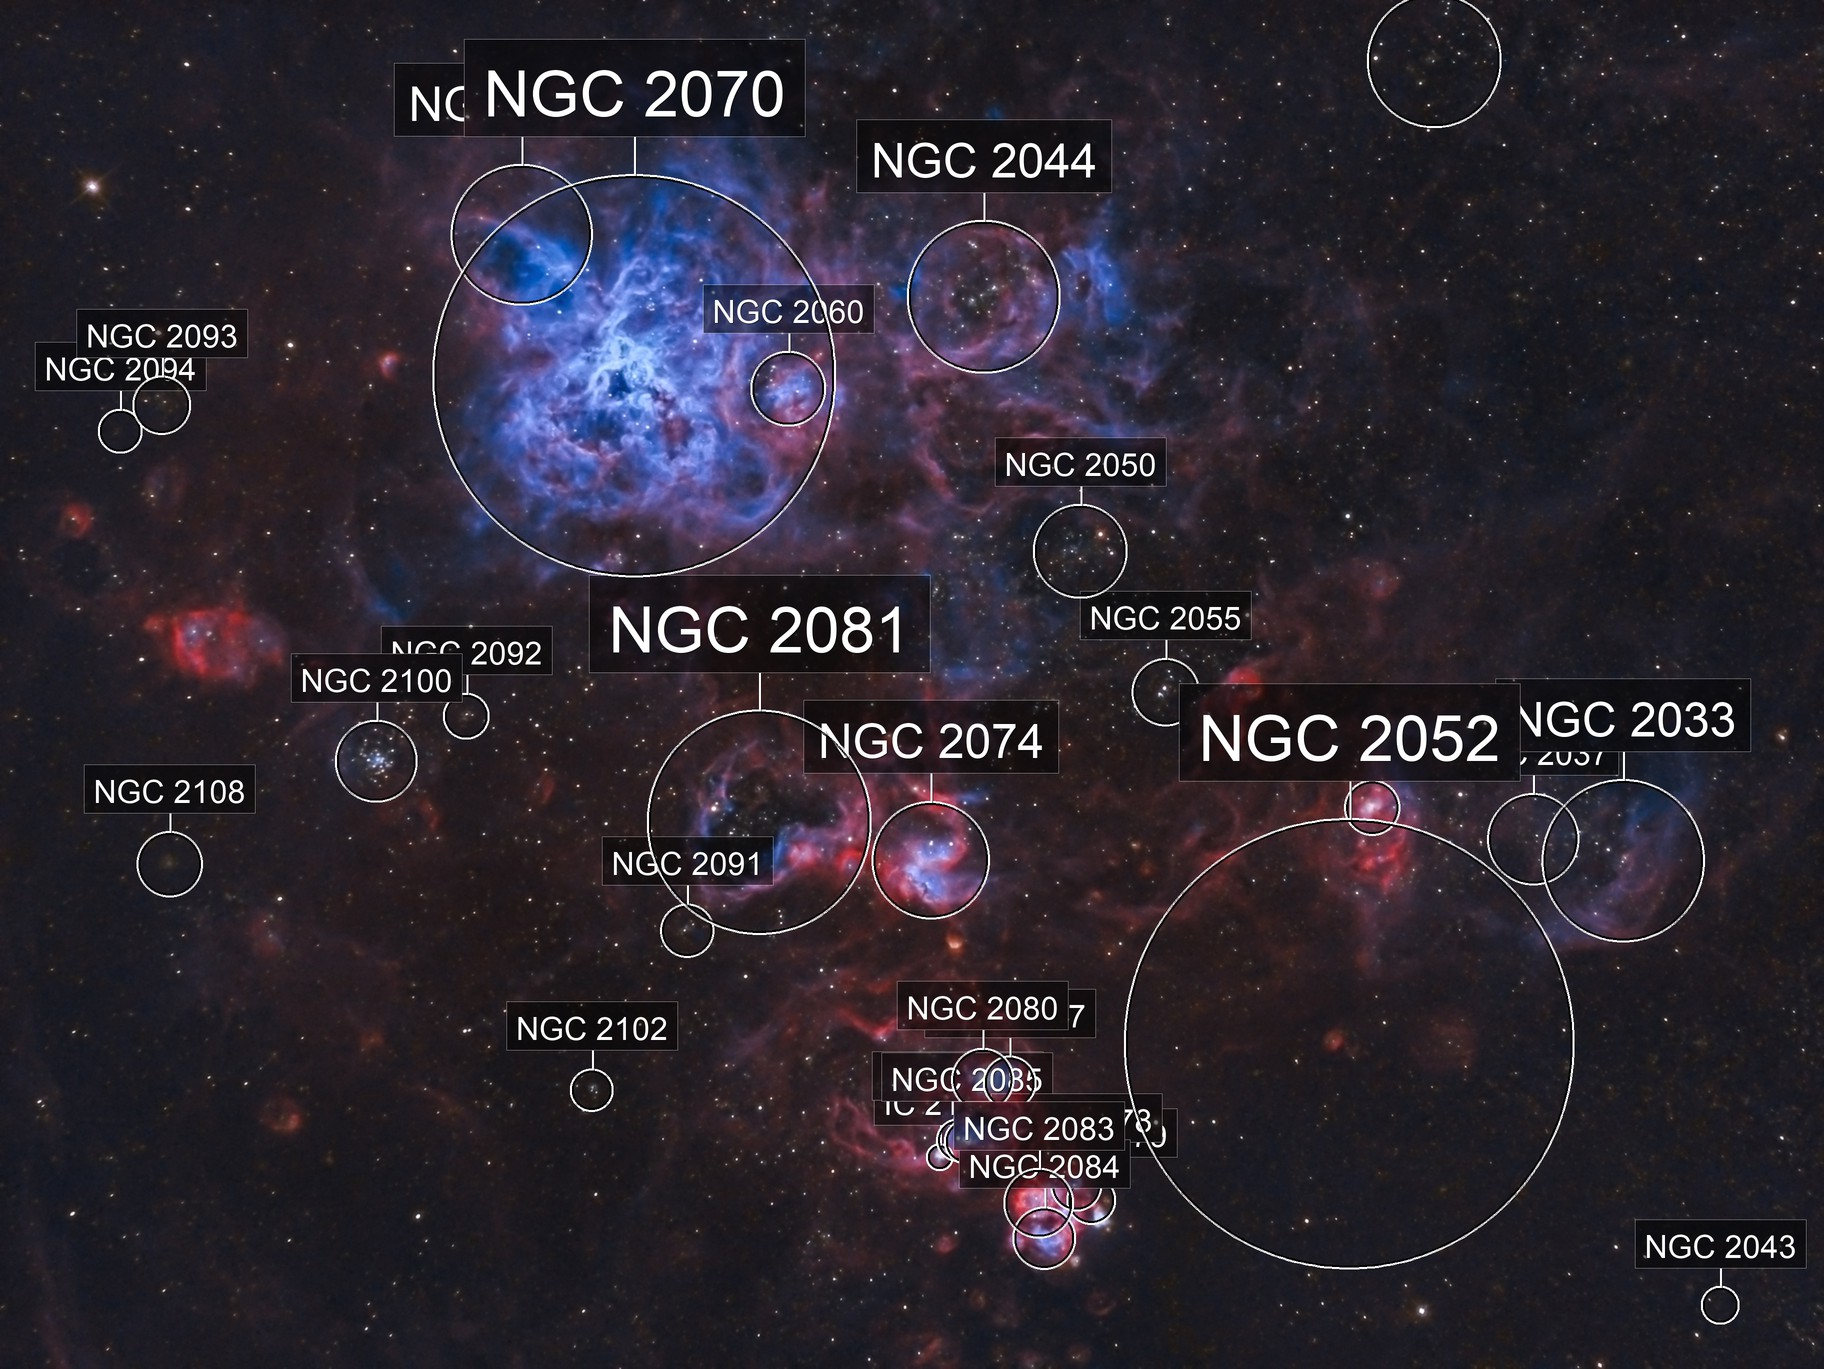 NGC2070 - Tarantula Nebula